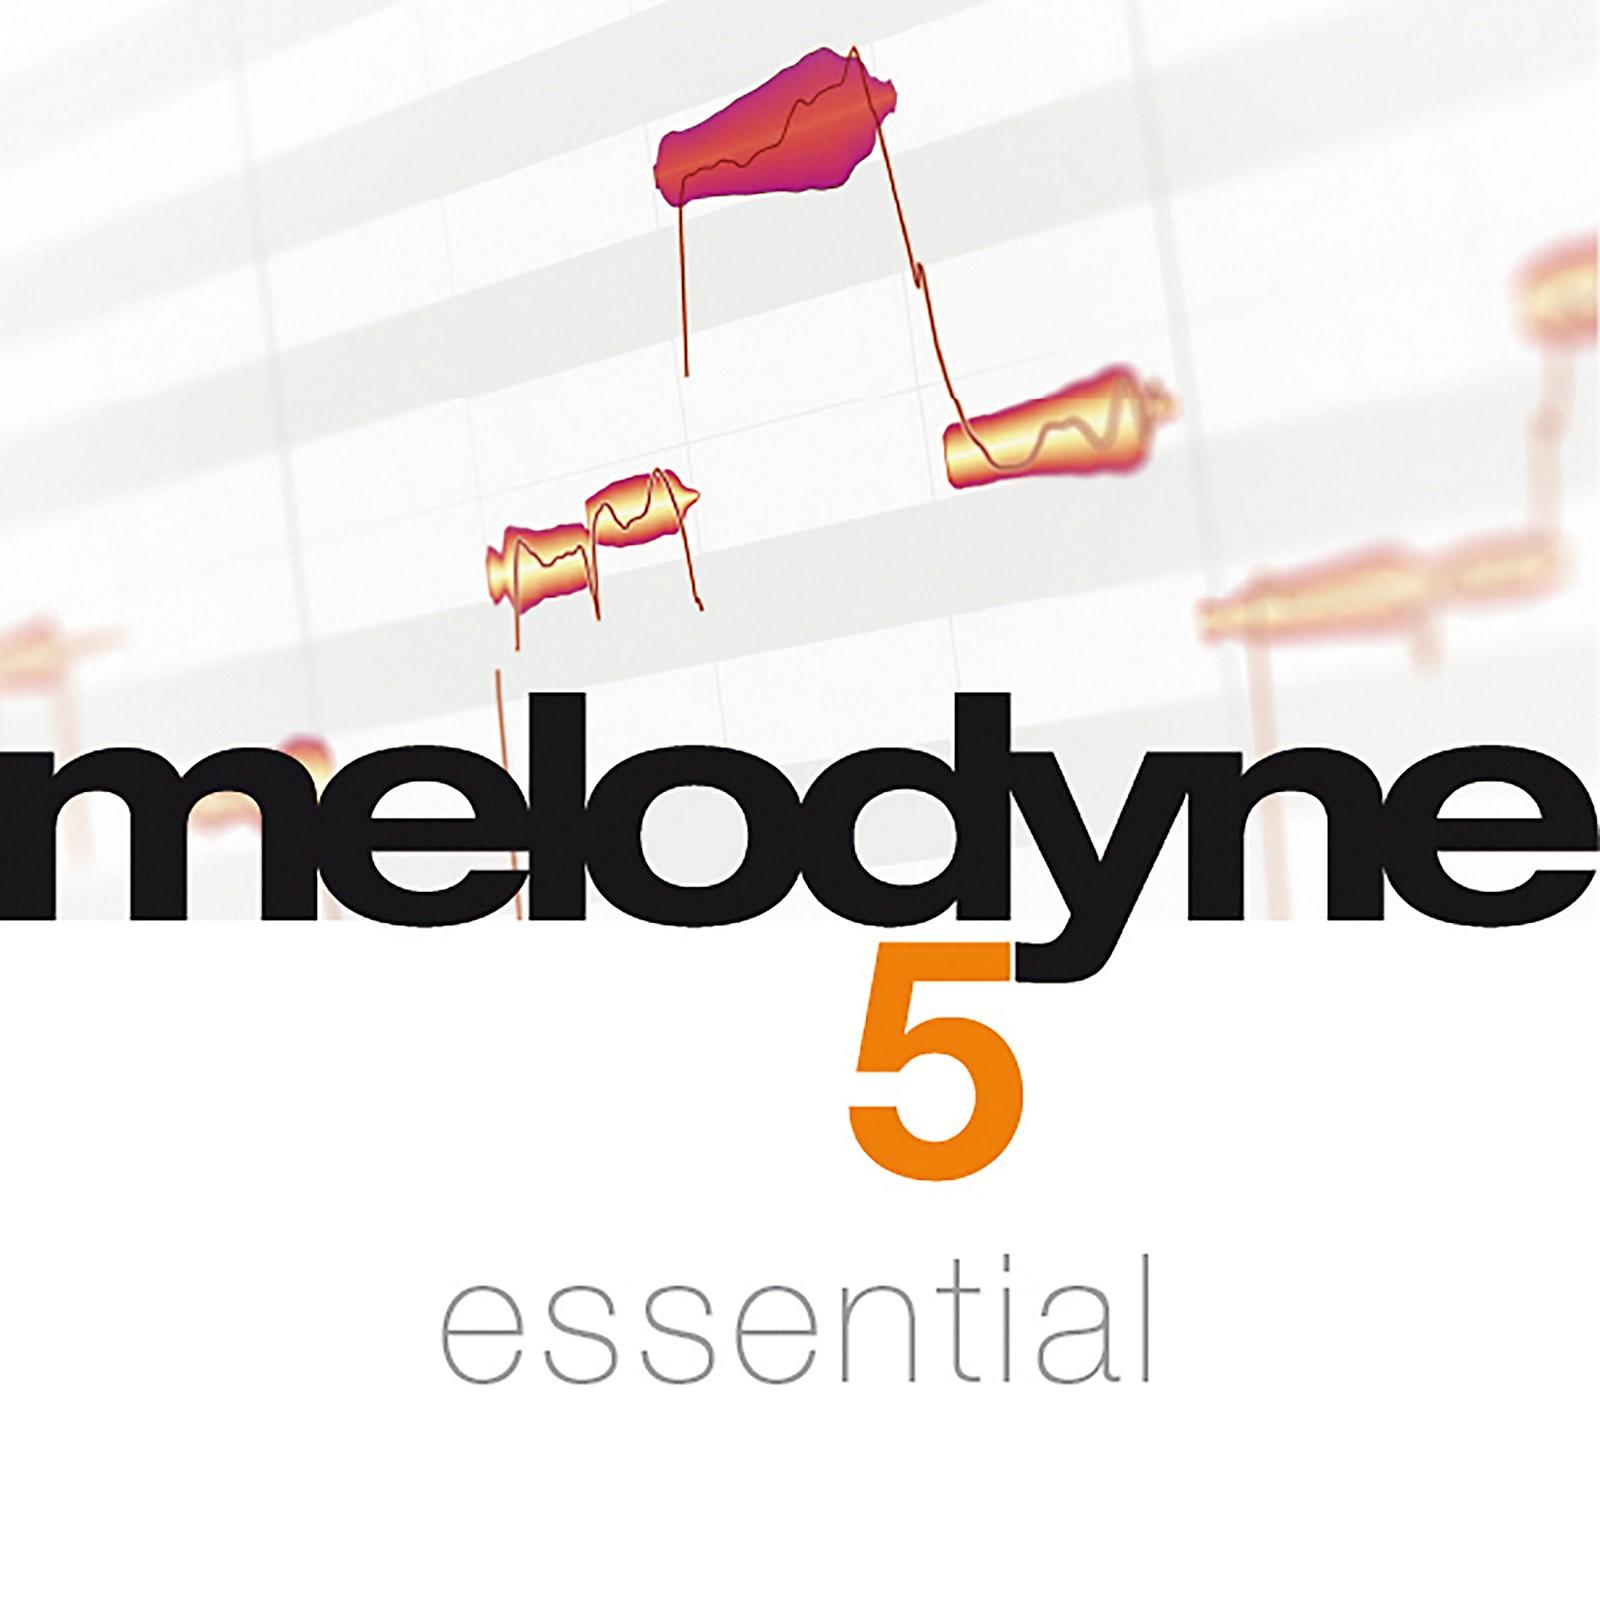 Celemony Melodyne 5 Essential (Software Download)